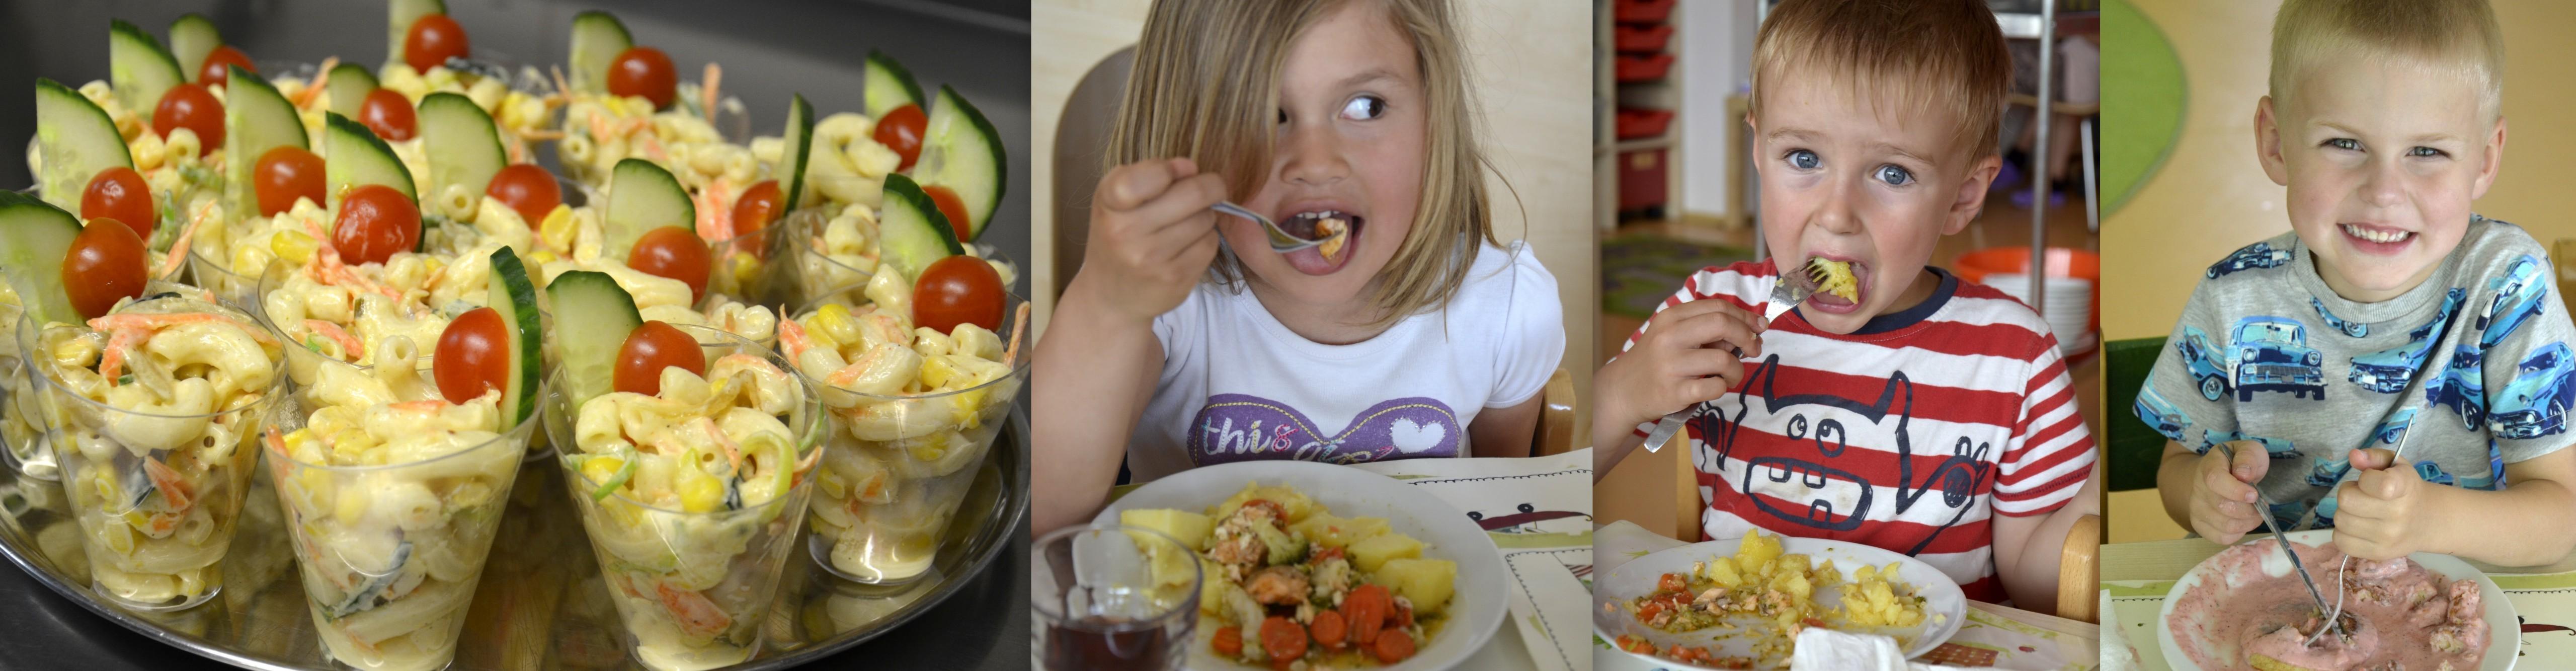 moderni gastronomie pro deti